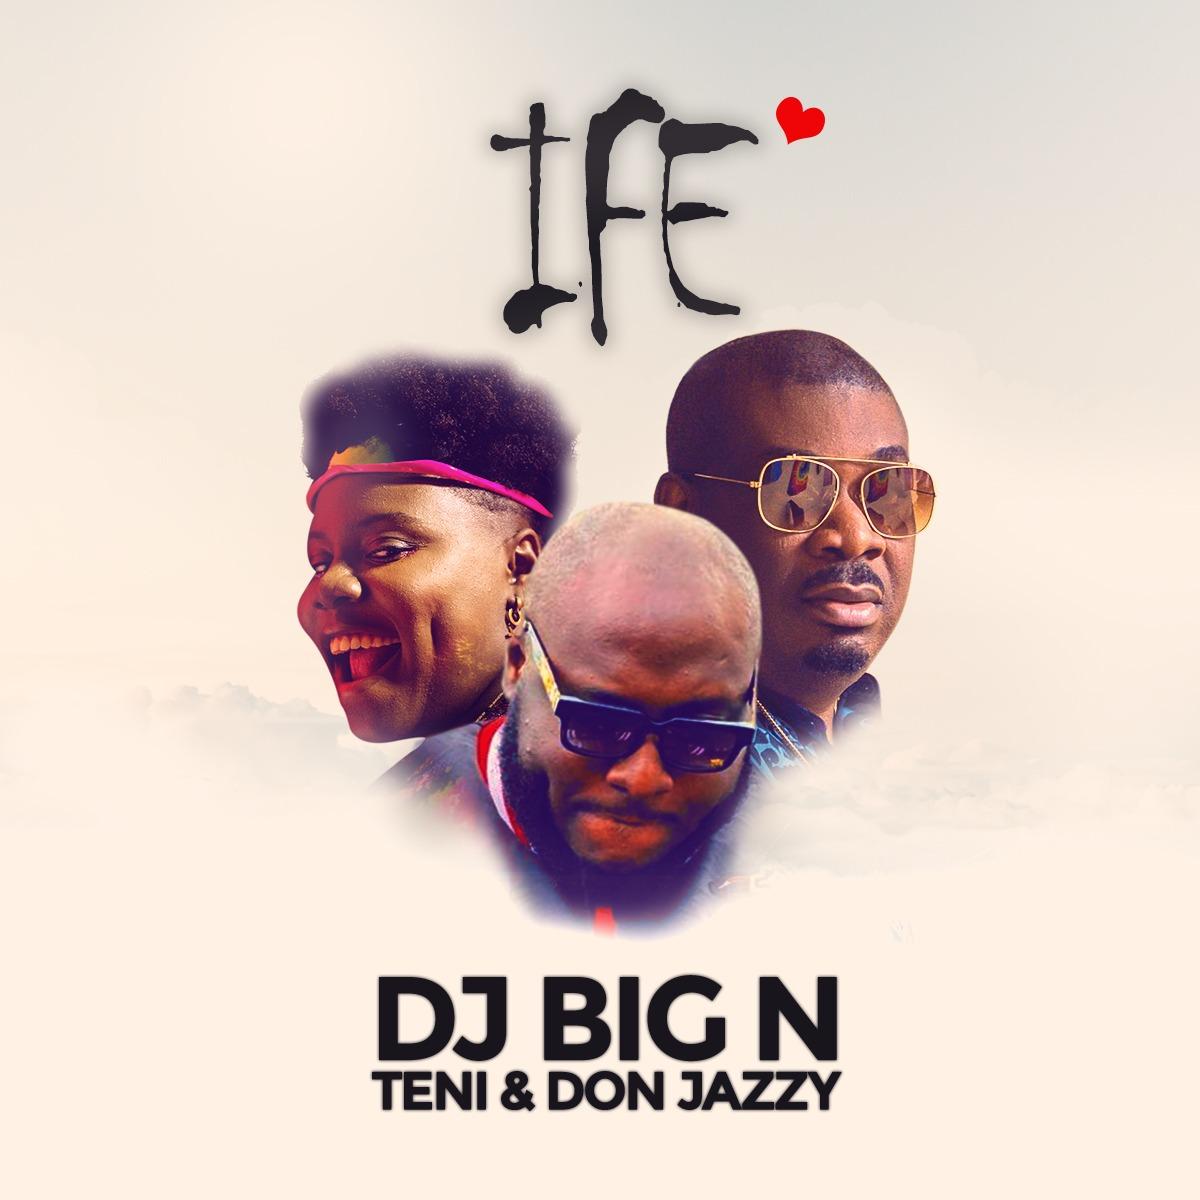 DJ Big N - Ife ft. Don Jazzy & Teni